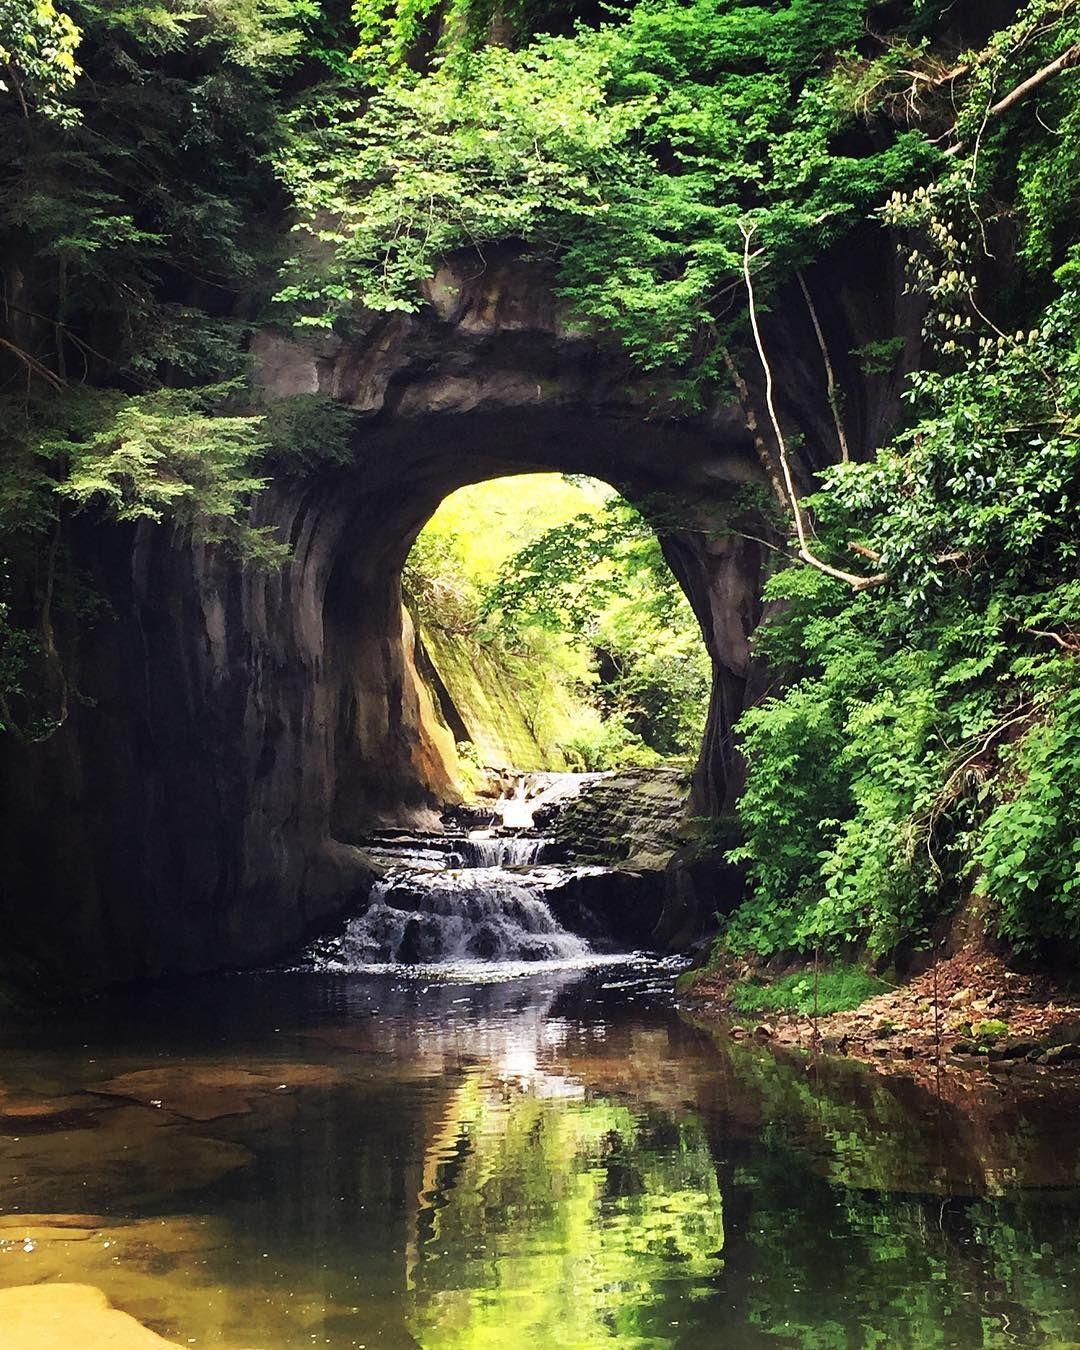 Nomizo No Taki Fall In Shimizu Keiryu Park Chiba Japan Japan Travel Bucket Lists Best Places To Travel Trip Planning